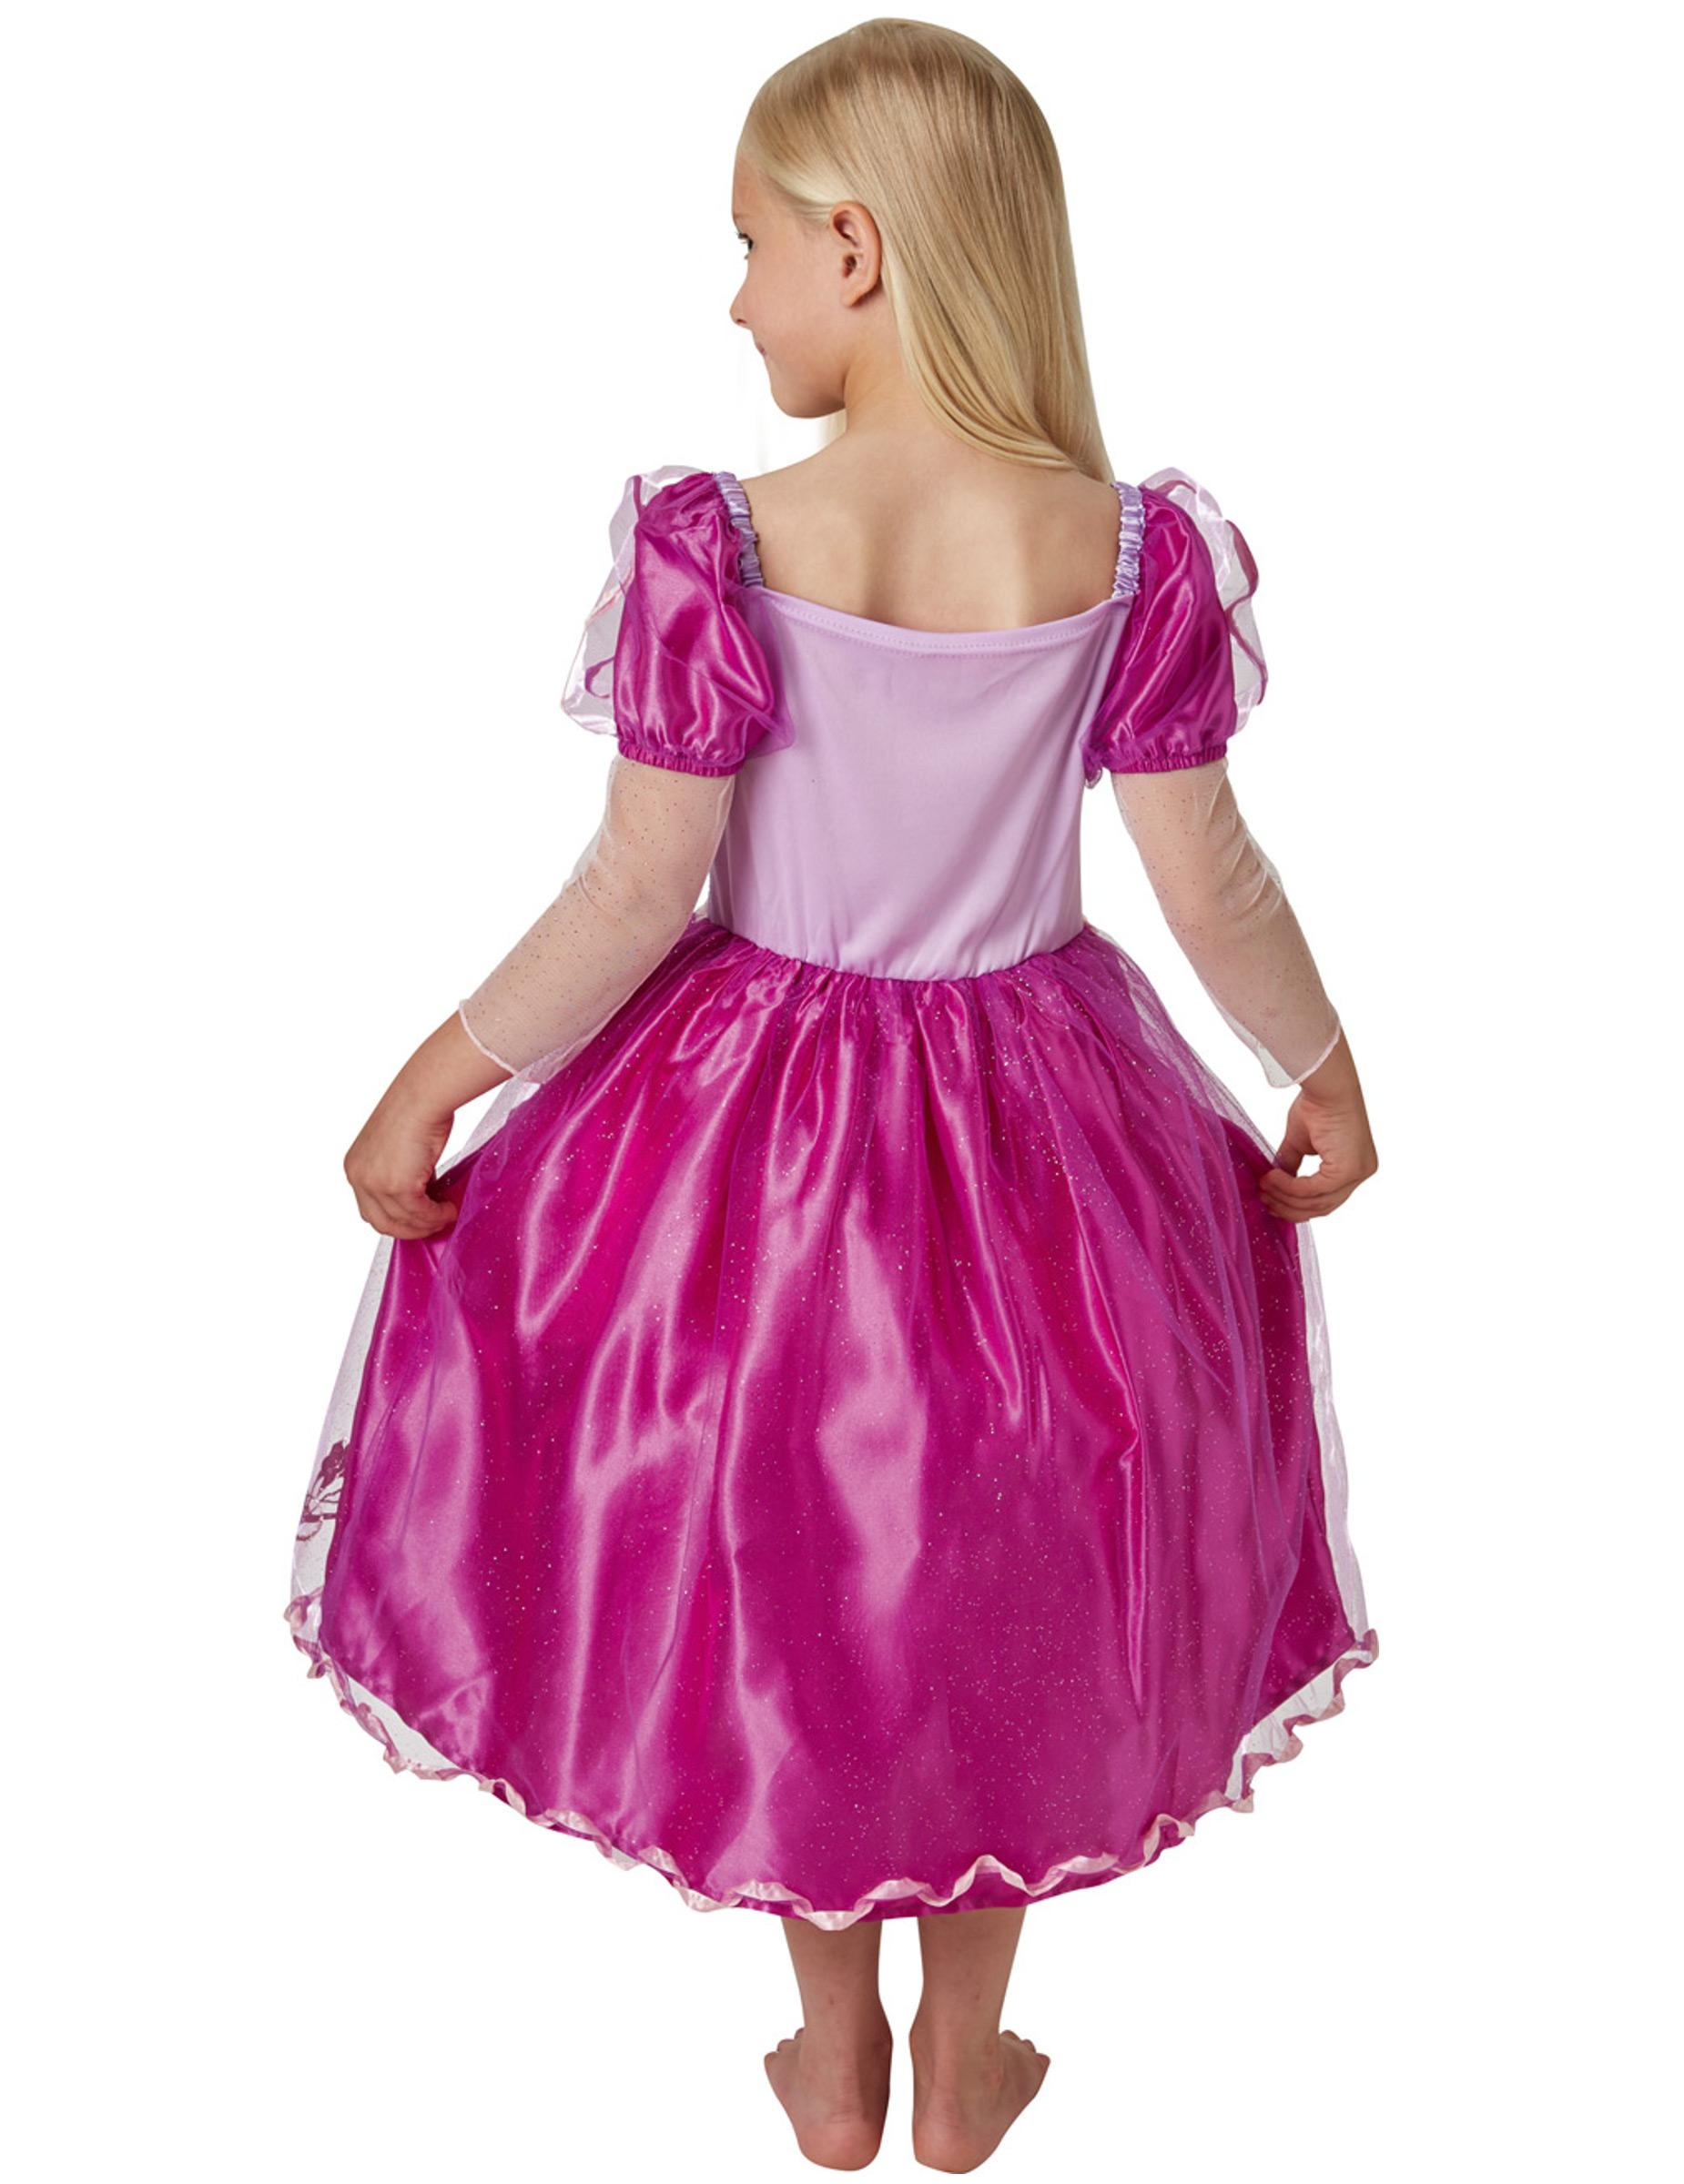 Barato Para La Venta Costume Raperonzolo classico bambina con cofanetto 5/6 anni (110/116) Para La Buena Línea Enchufe De Fábrica De La Venta Barata l9ZooRr